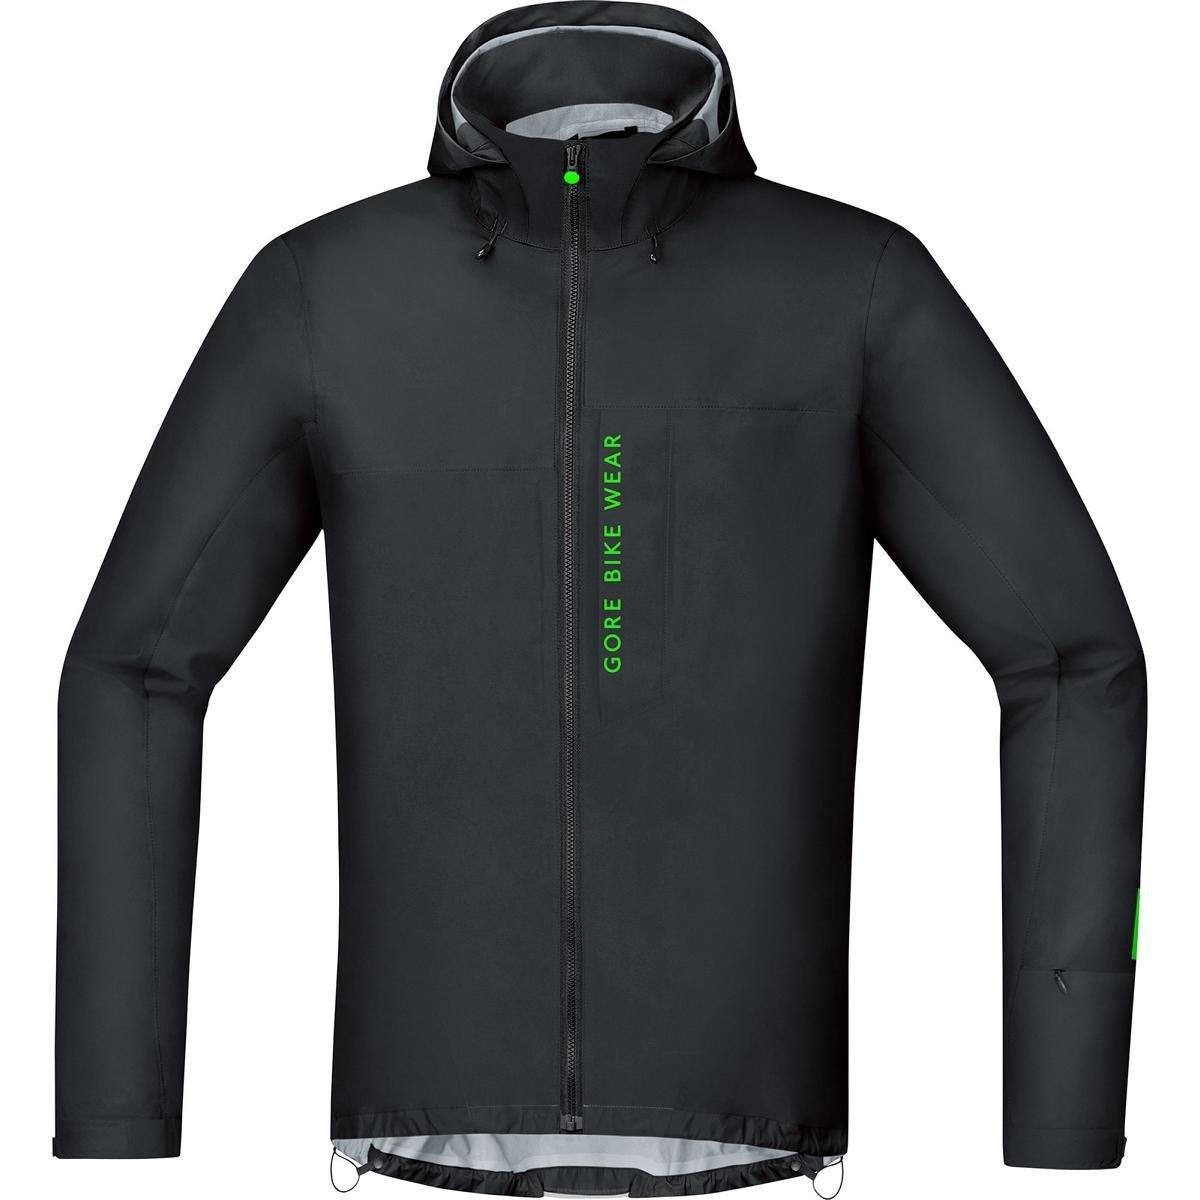 GORE BIKE WEAR Chaqueta MTB para Hombre, GORE-TEX Active, POWER TRAIL GT AS Jacket, Talla M, Negro, JGPOWM990004: Amazon.es: Deportes y aire libre